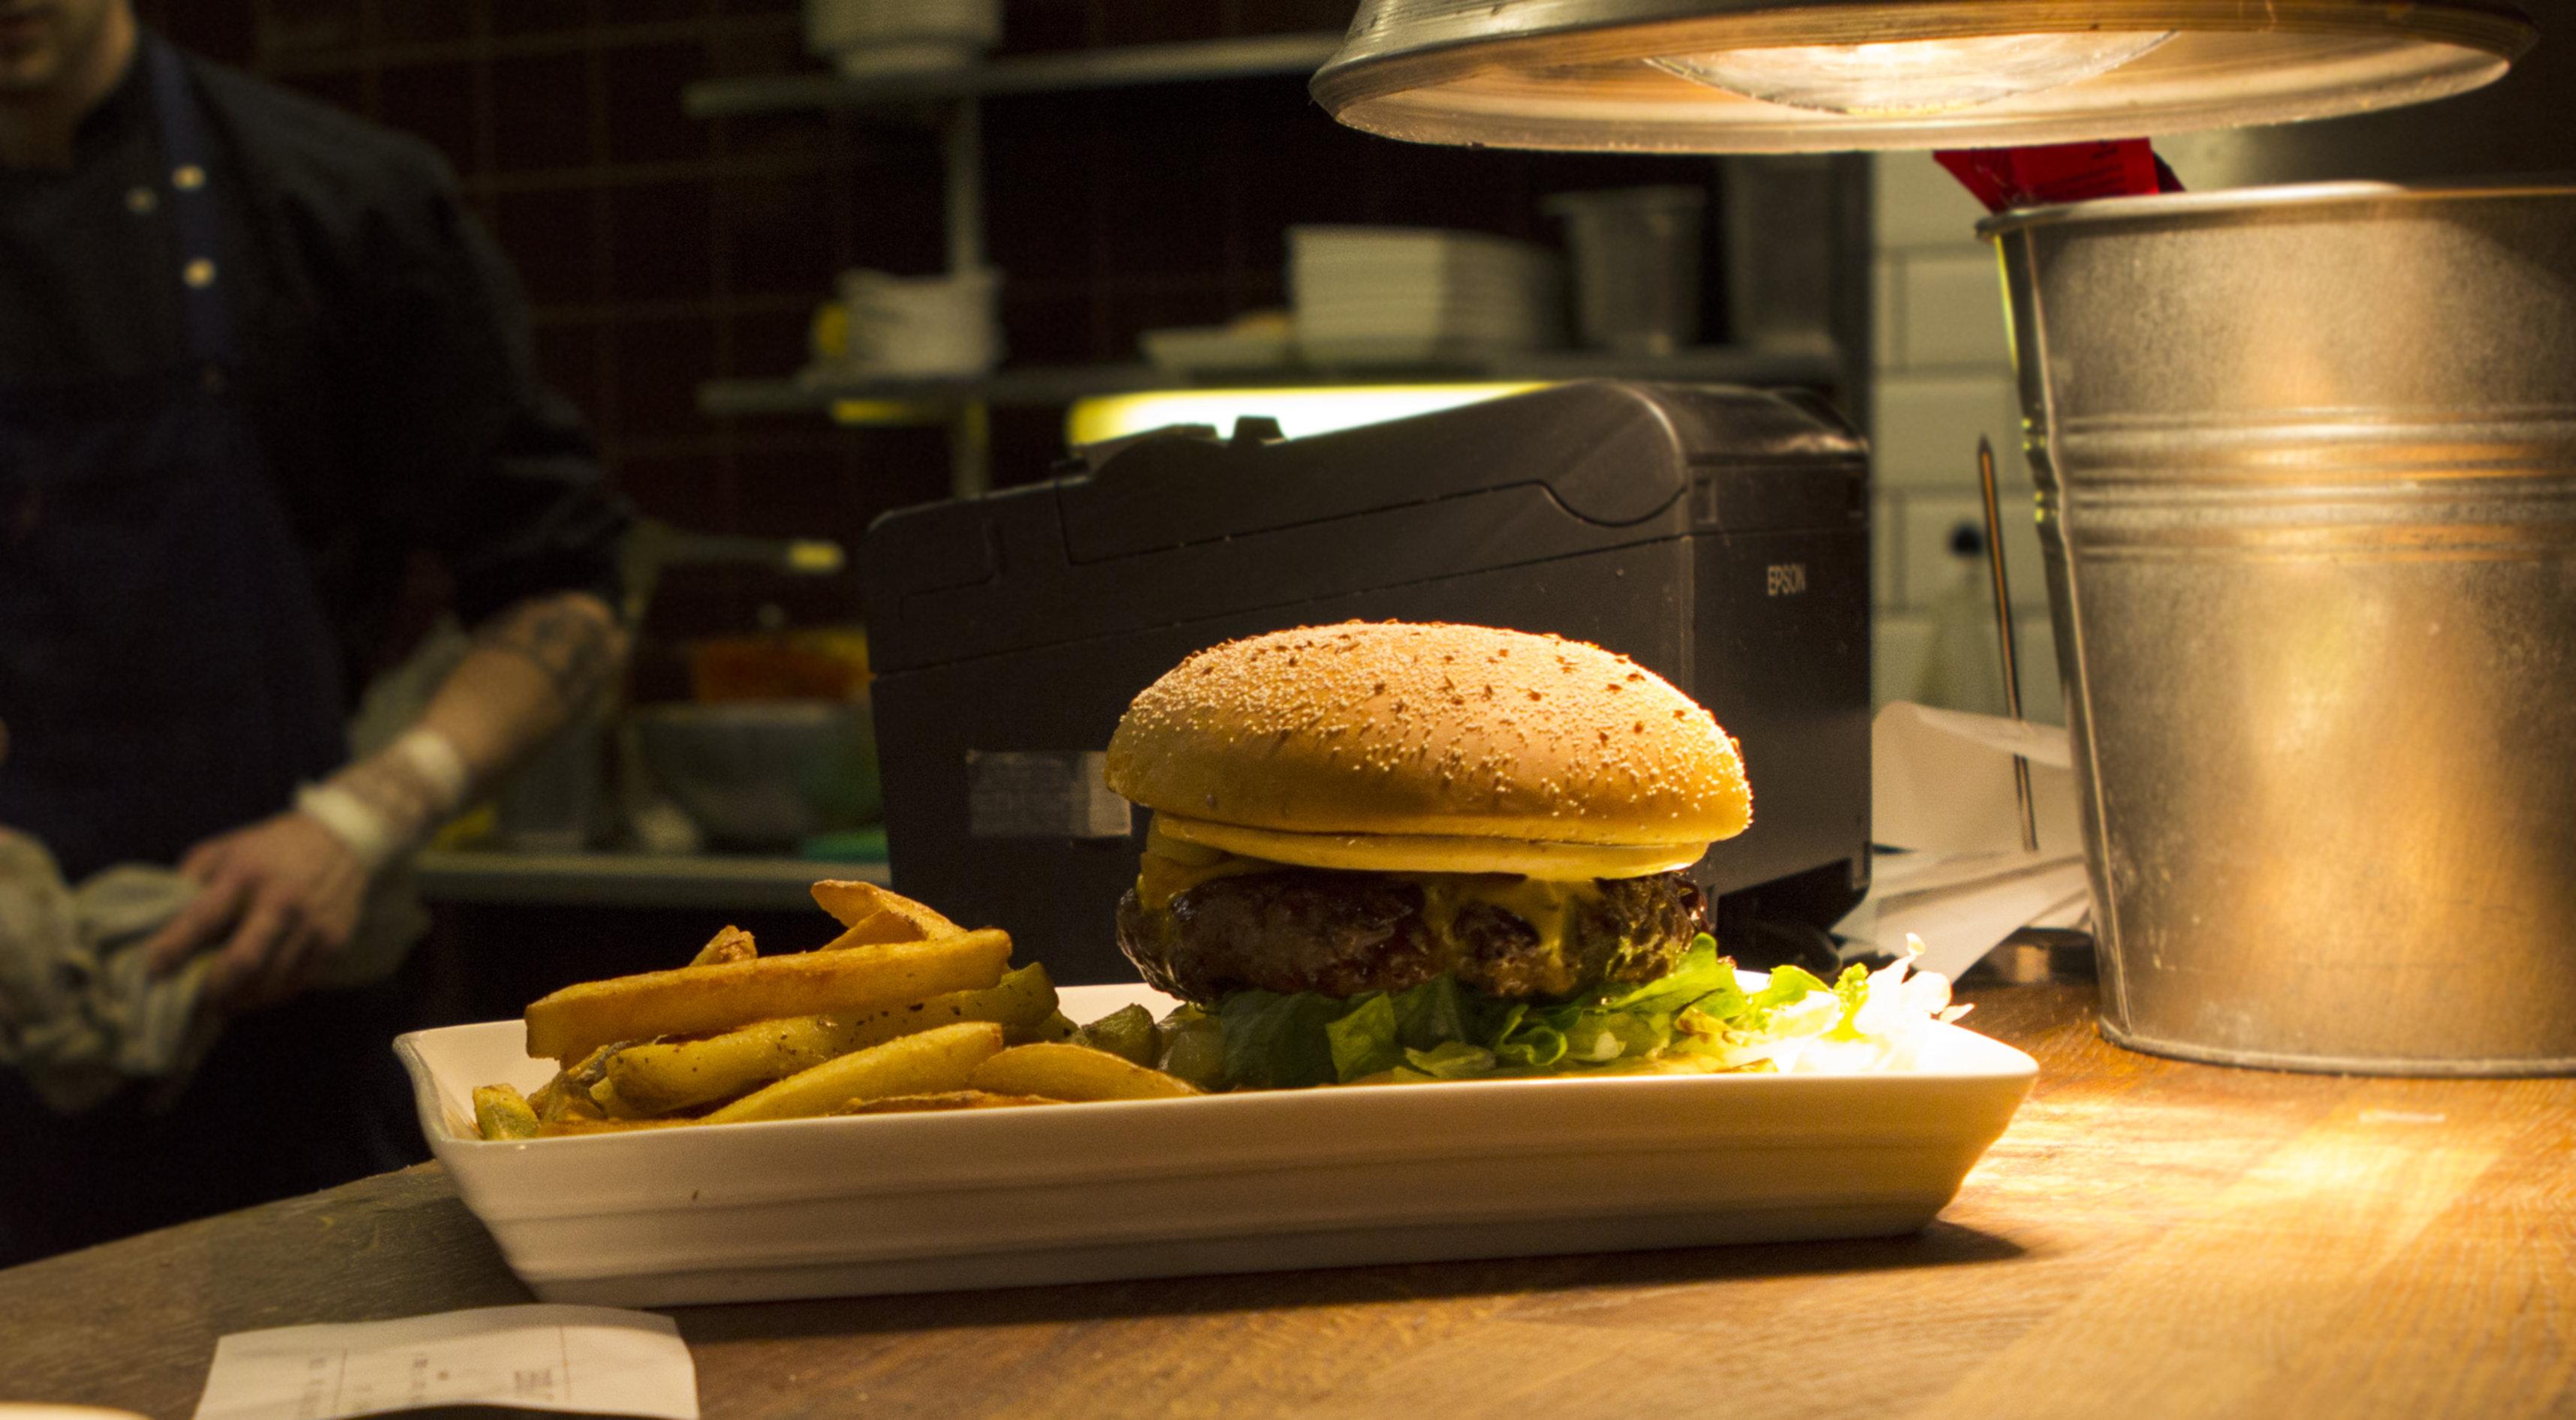 Kiila food bar helsinki menu arvostelut for Kiila food bar 00100 kalevankatu 1 helsinki suomi